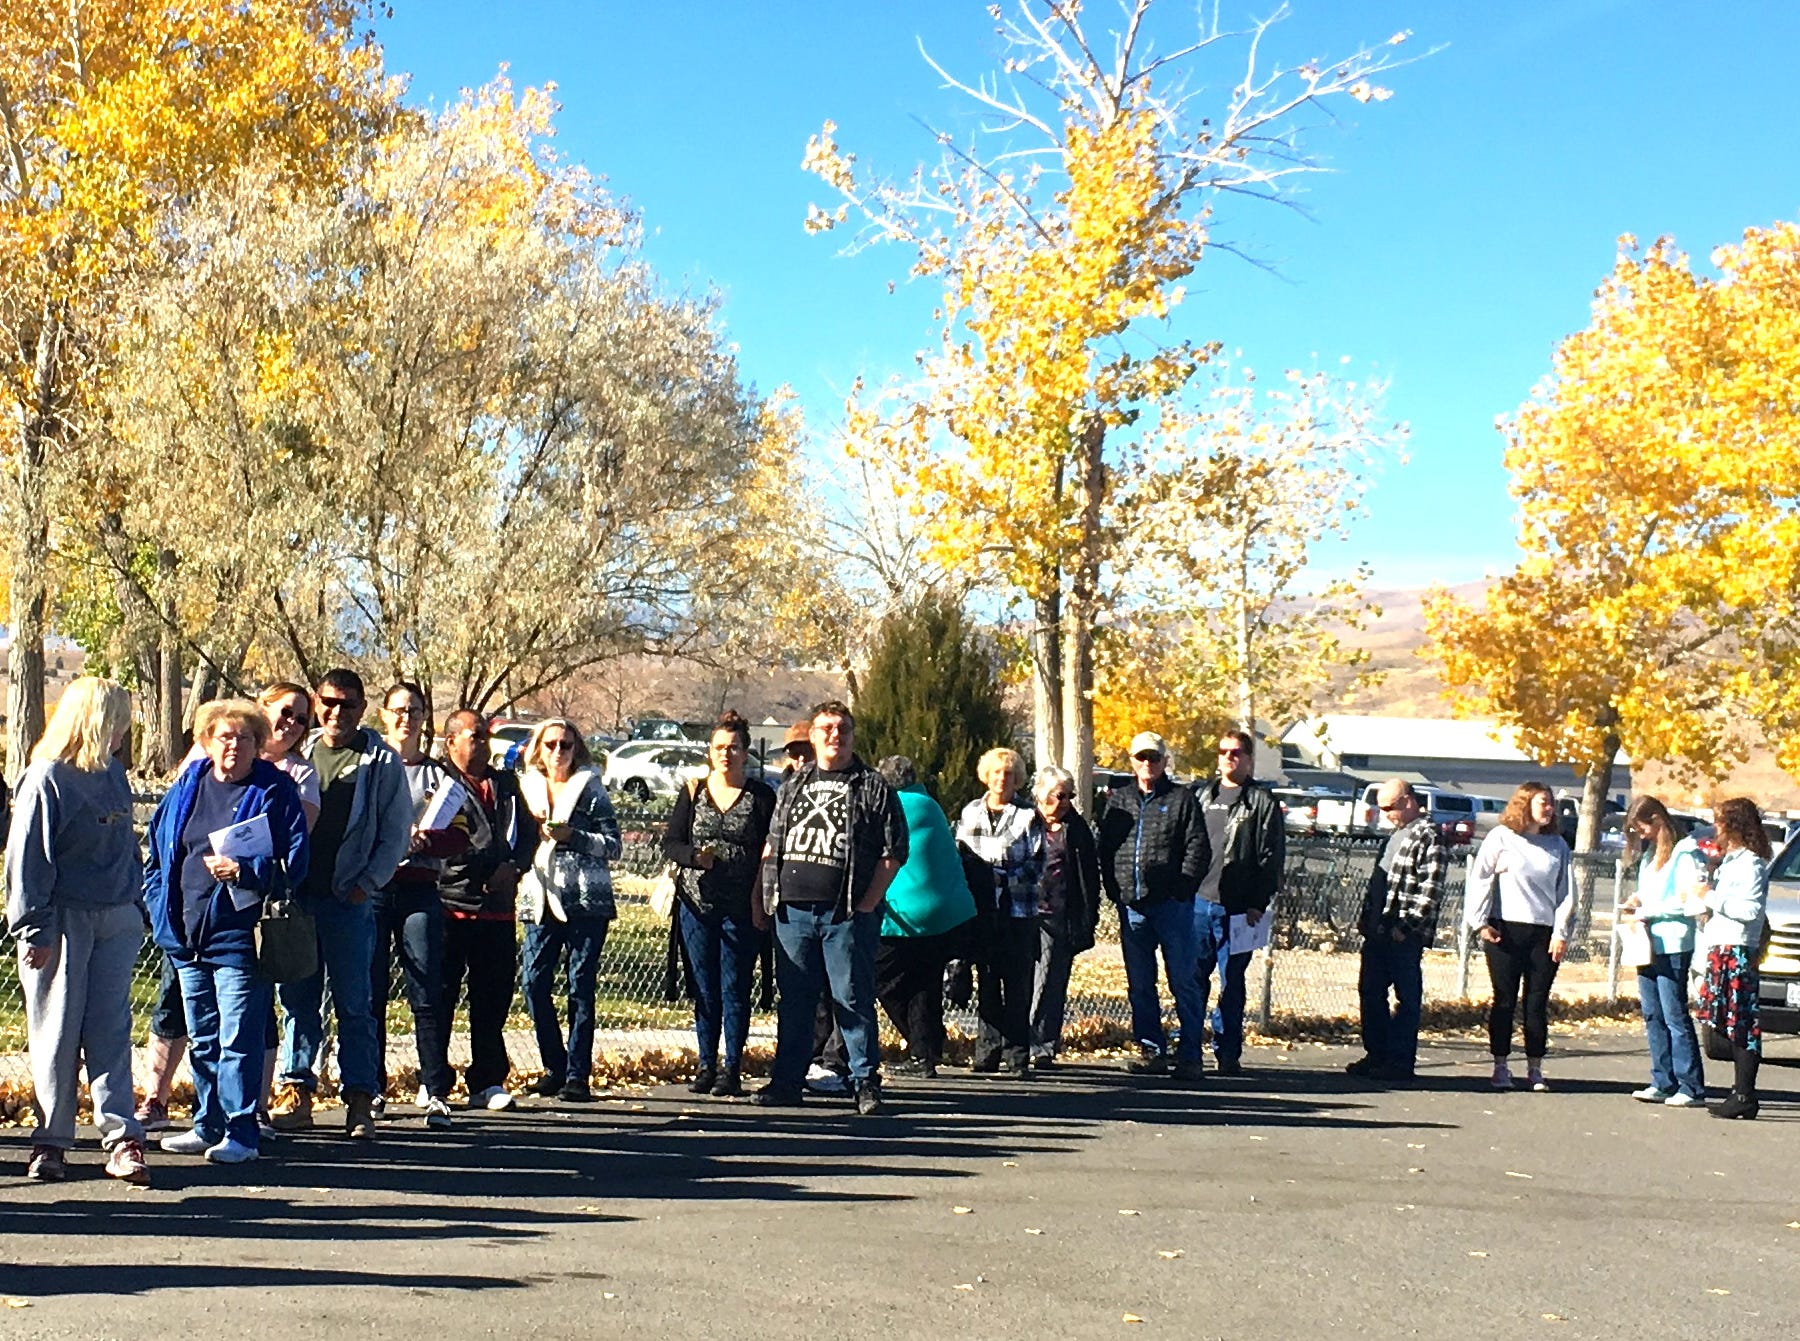 Voters wait in line in Dayton.